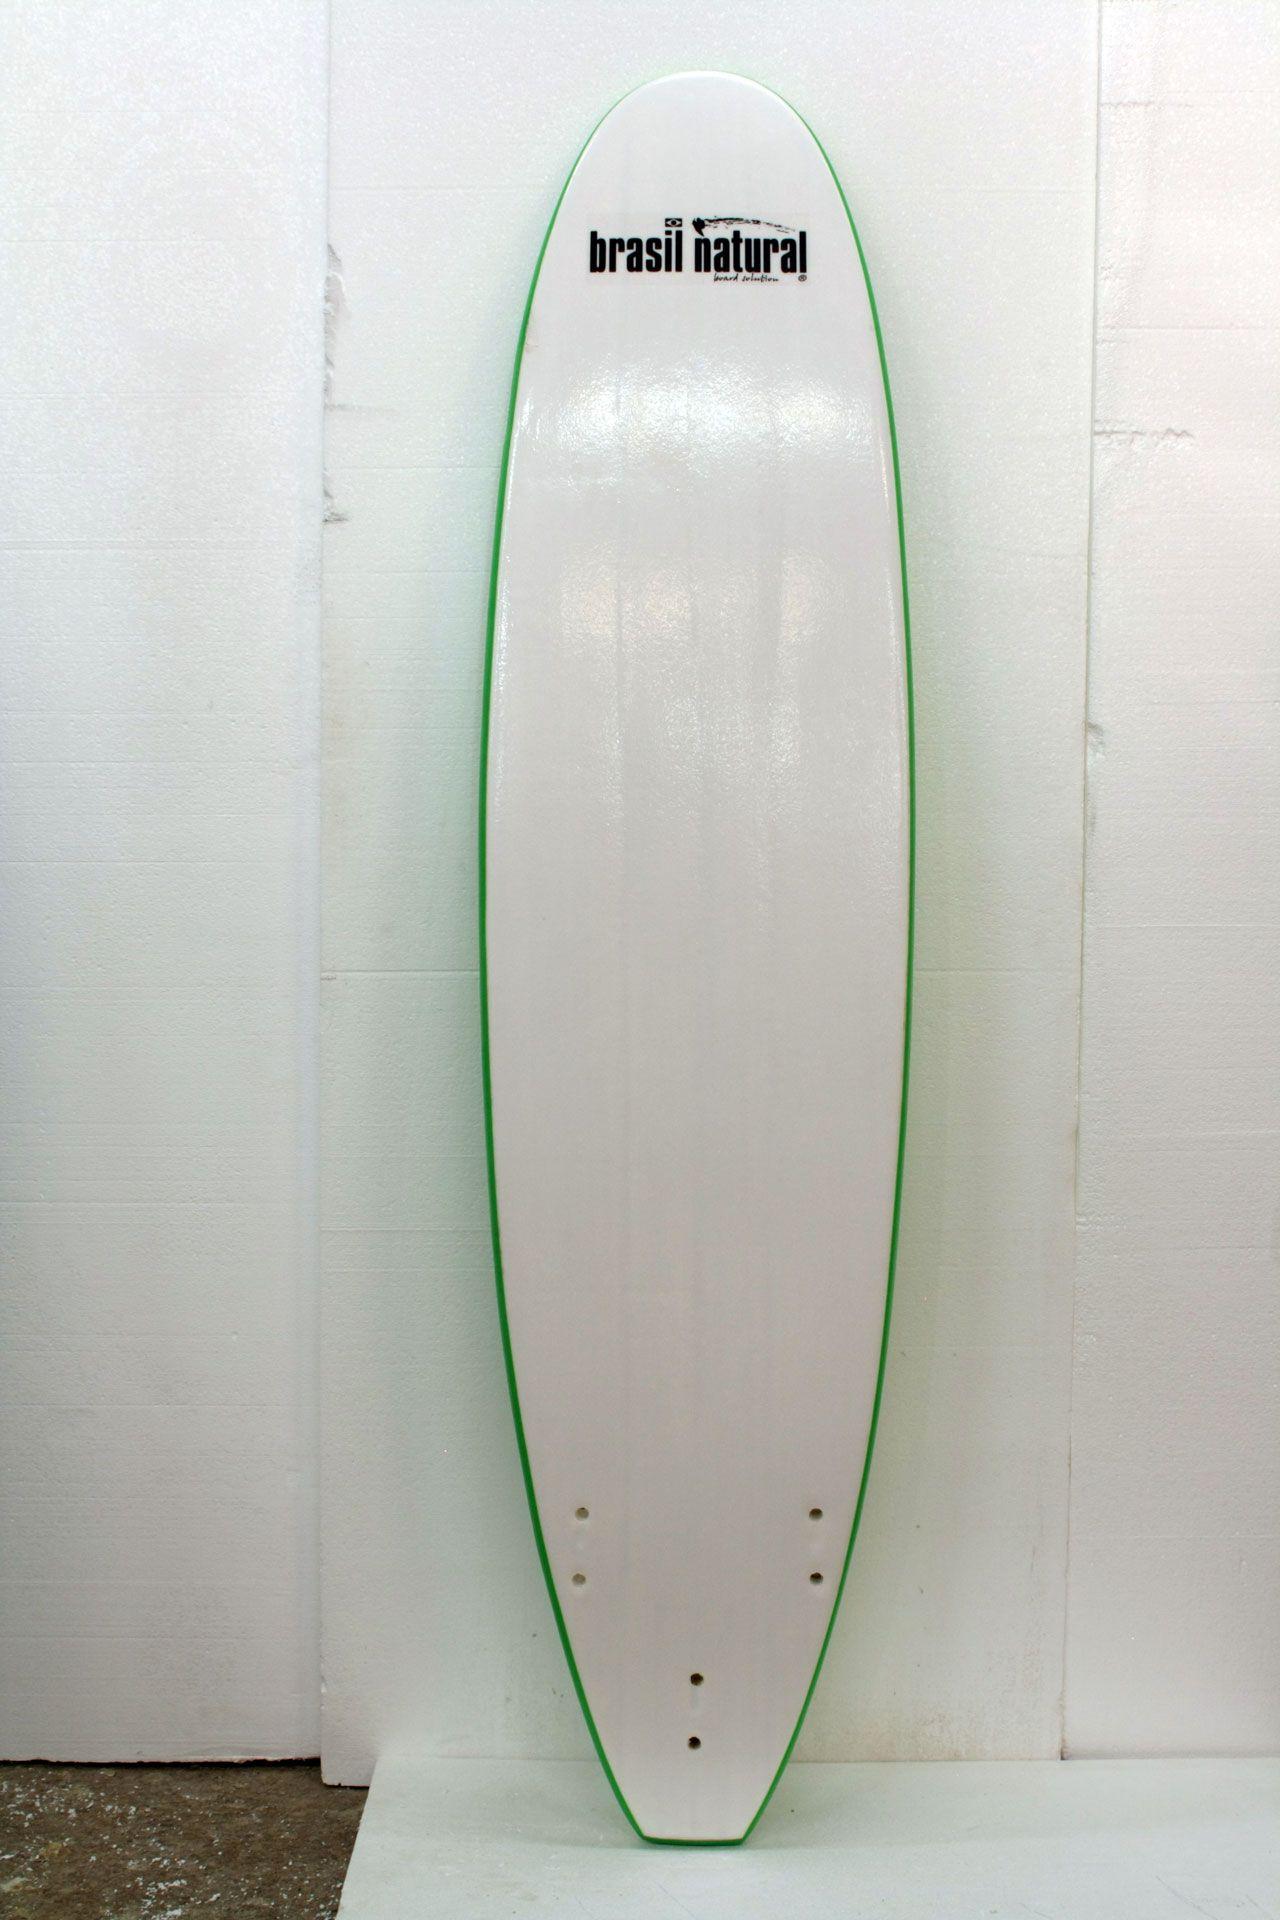 073b68a70 ... Prancha de surf fun board 7.6 Semi Nova + kit surf - Brasil Natural -  Brasil ...